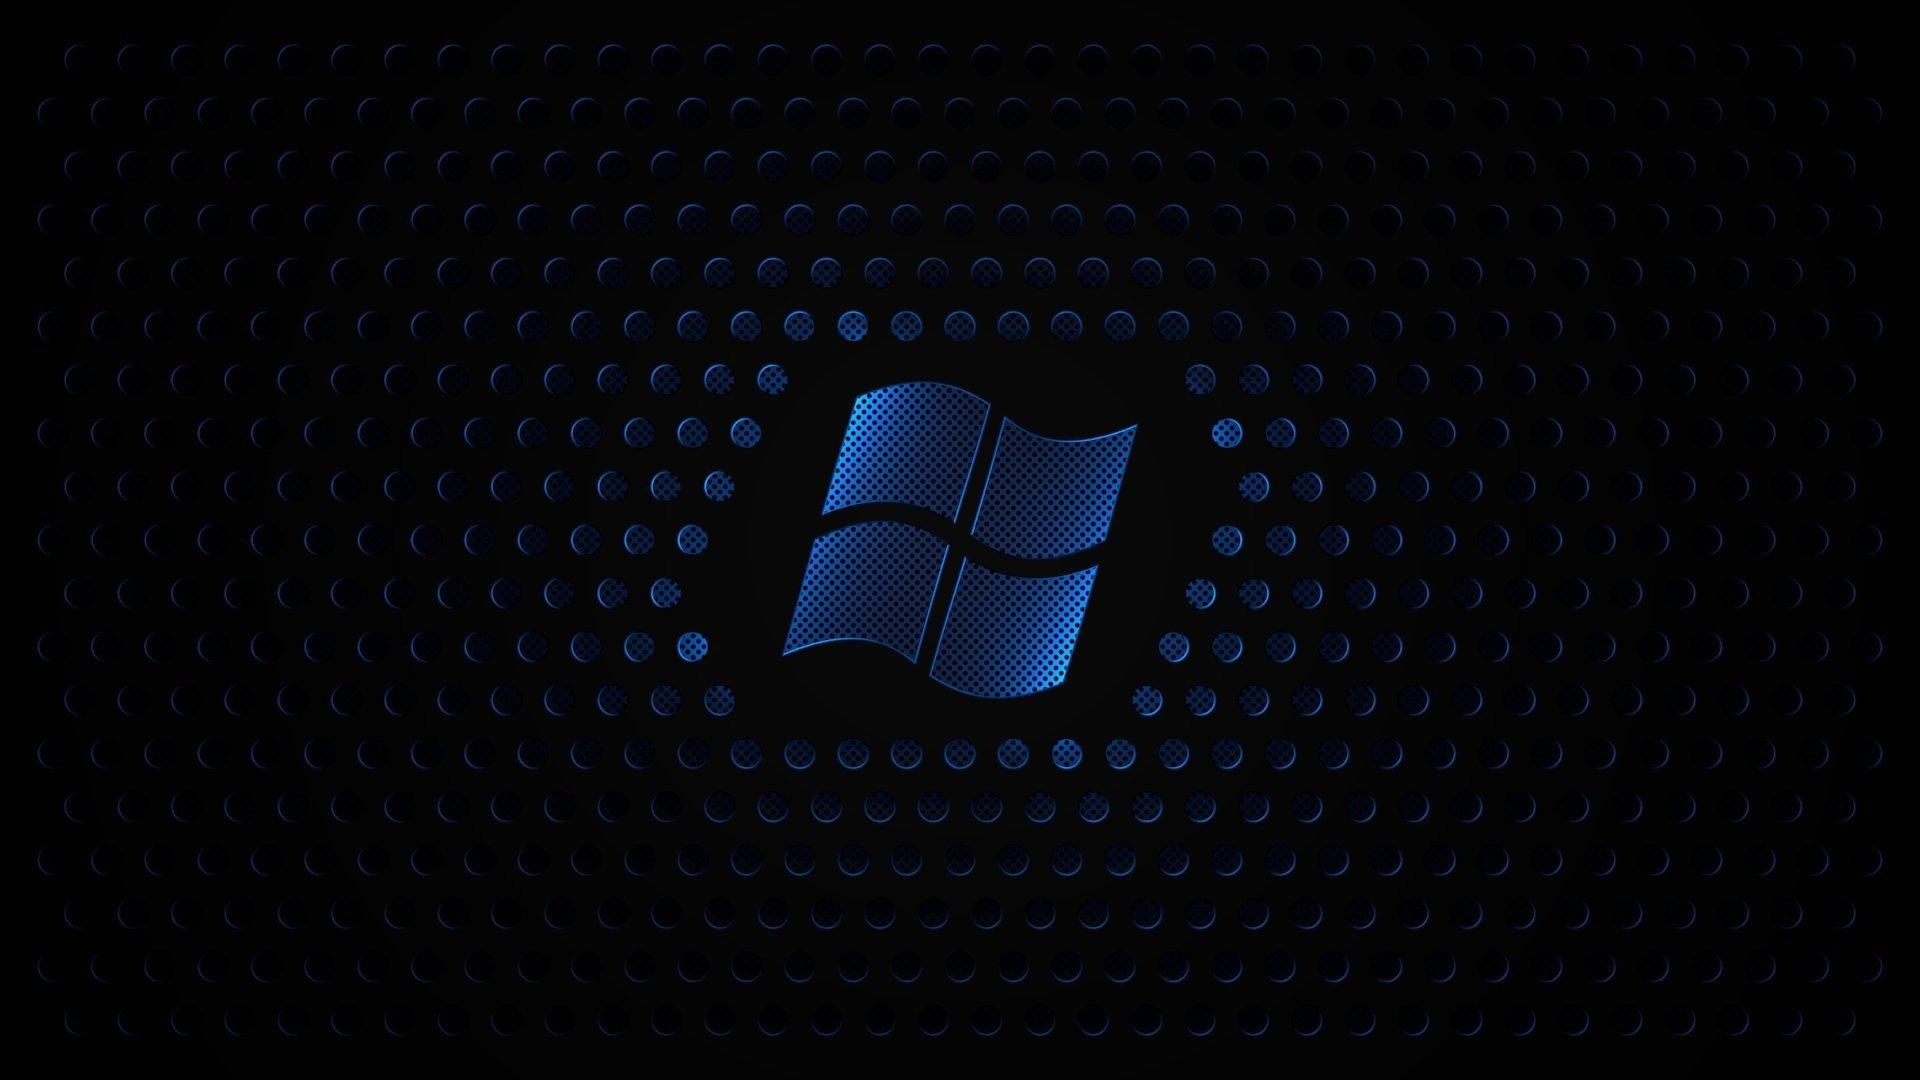 Windows Ultimate Wallpaper Hd 1920x1080